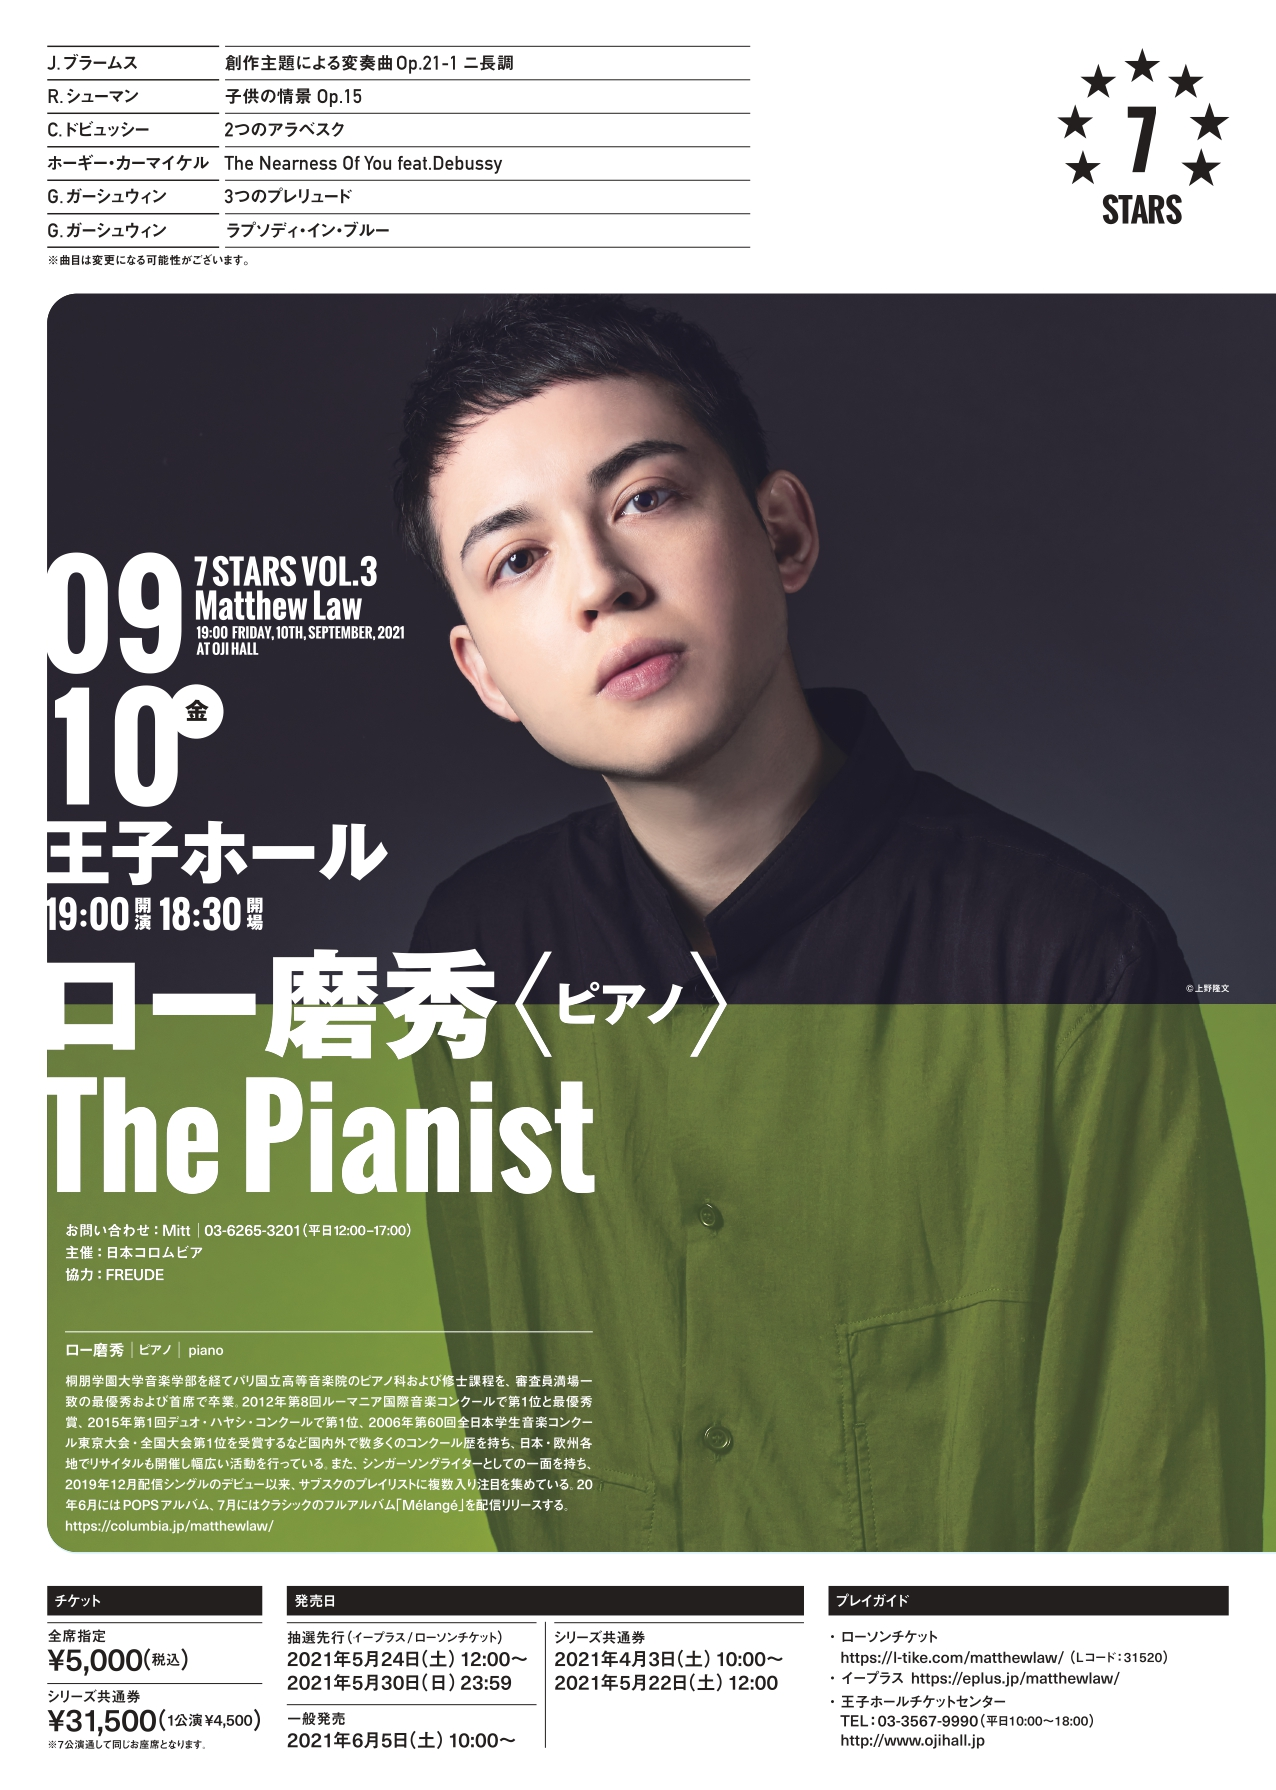 7 STARS VOL.3 ロー磨秀「The Pianist」